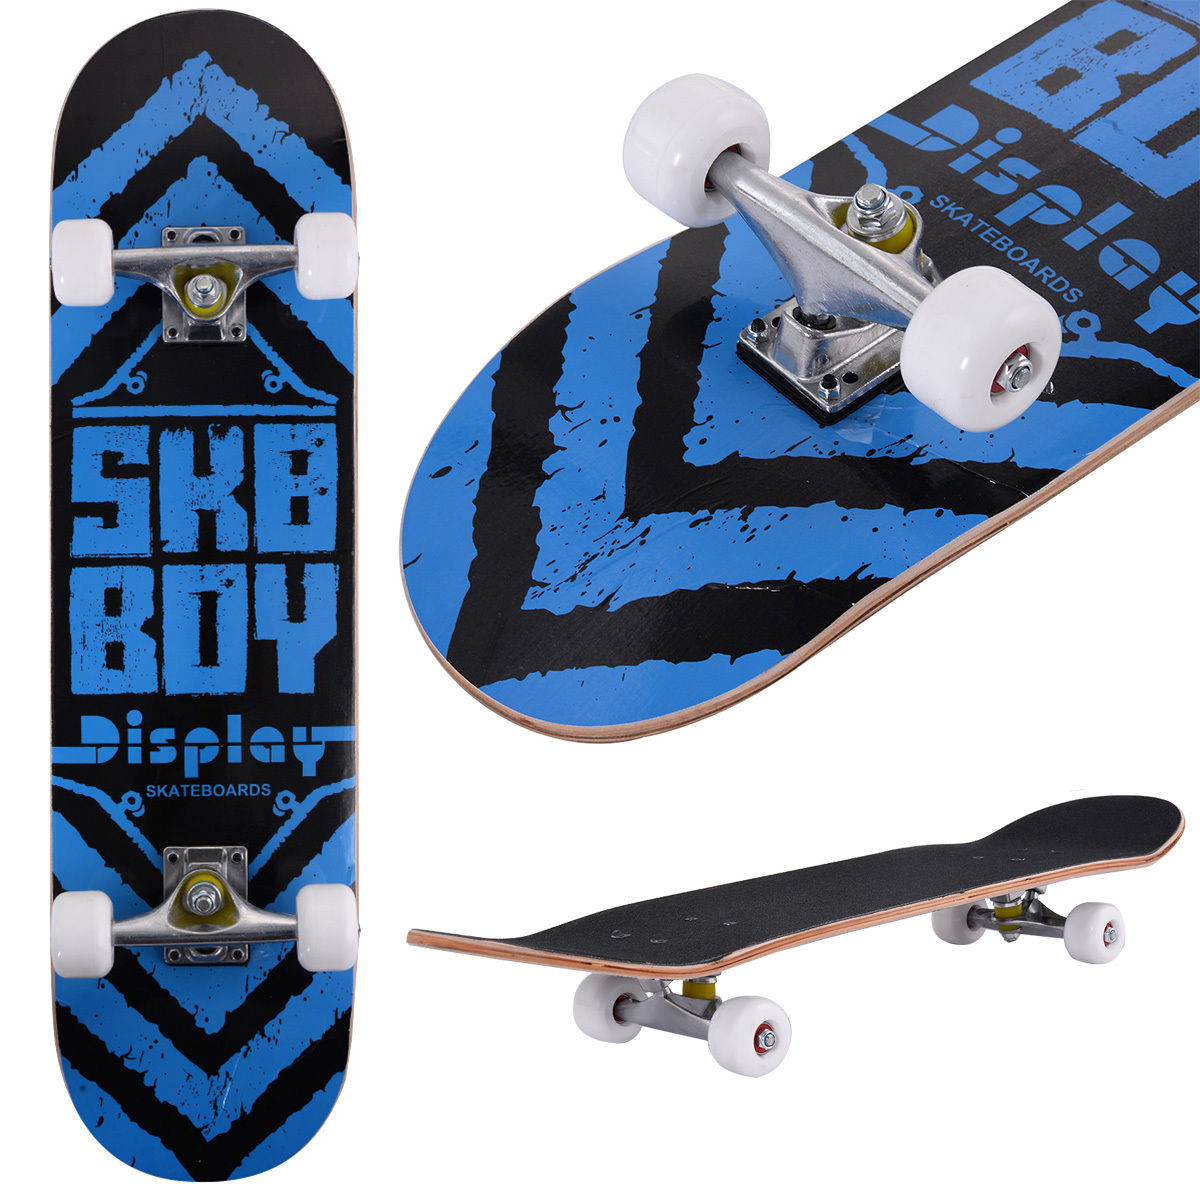 Costway 31'' x 8'' Professional Skateboard Longboard Complete Trucks Maple Deck Wood Child